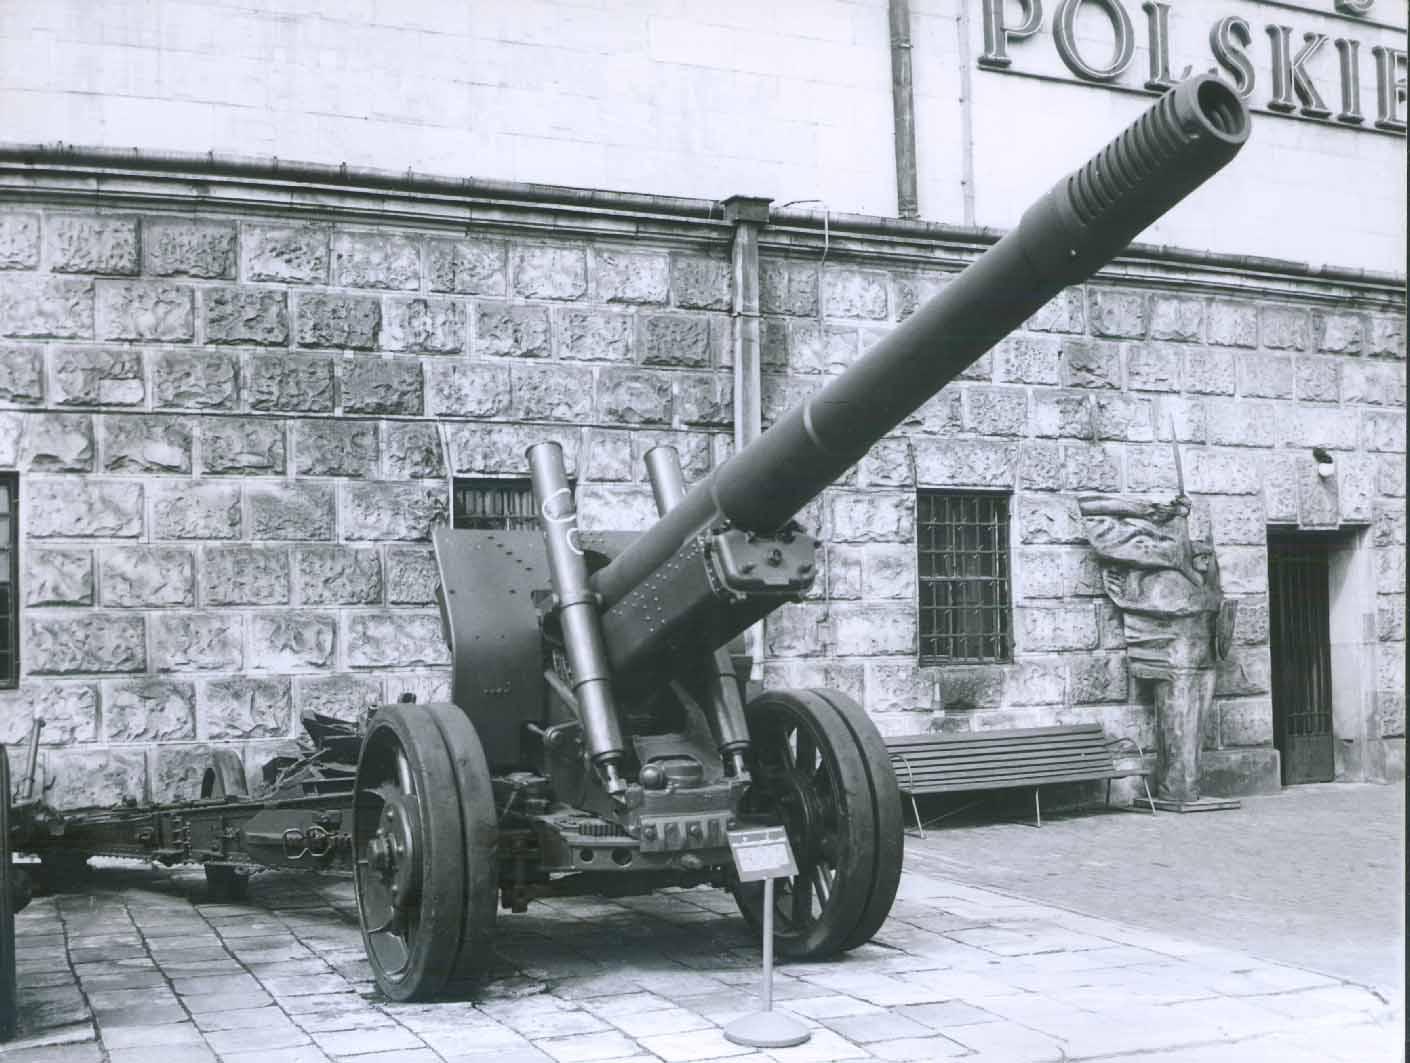 Haubicoarmata wz. 1937 (MŁ-20) kal. 152 mm